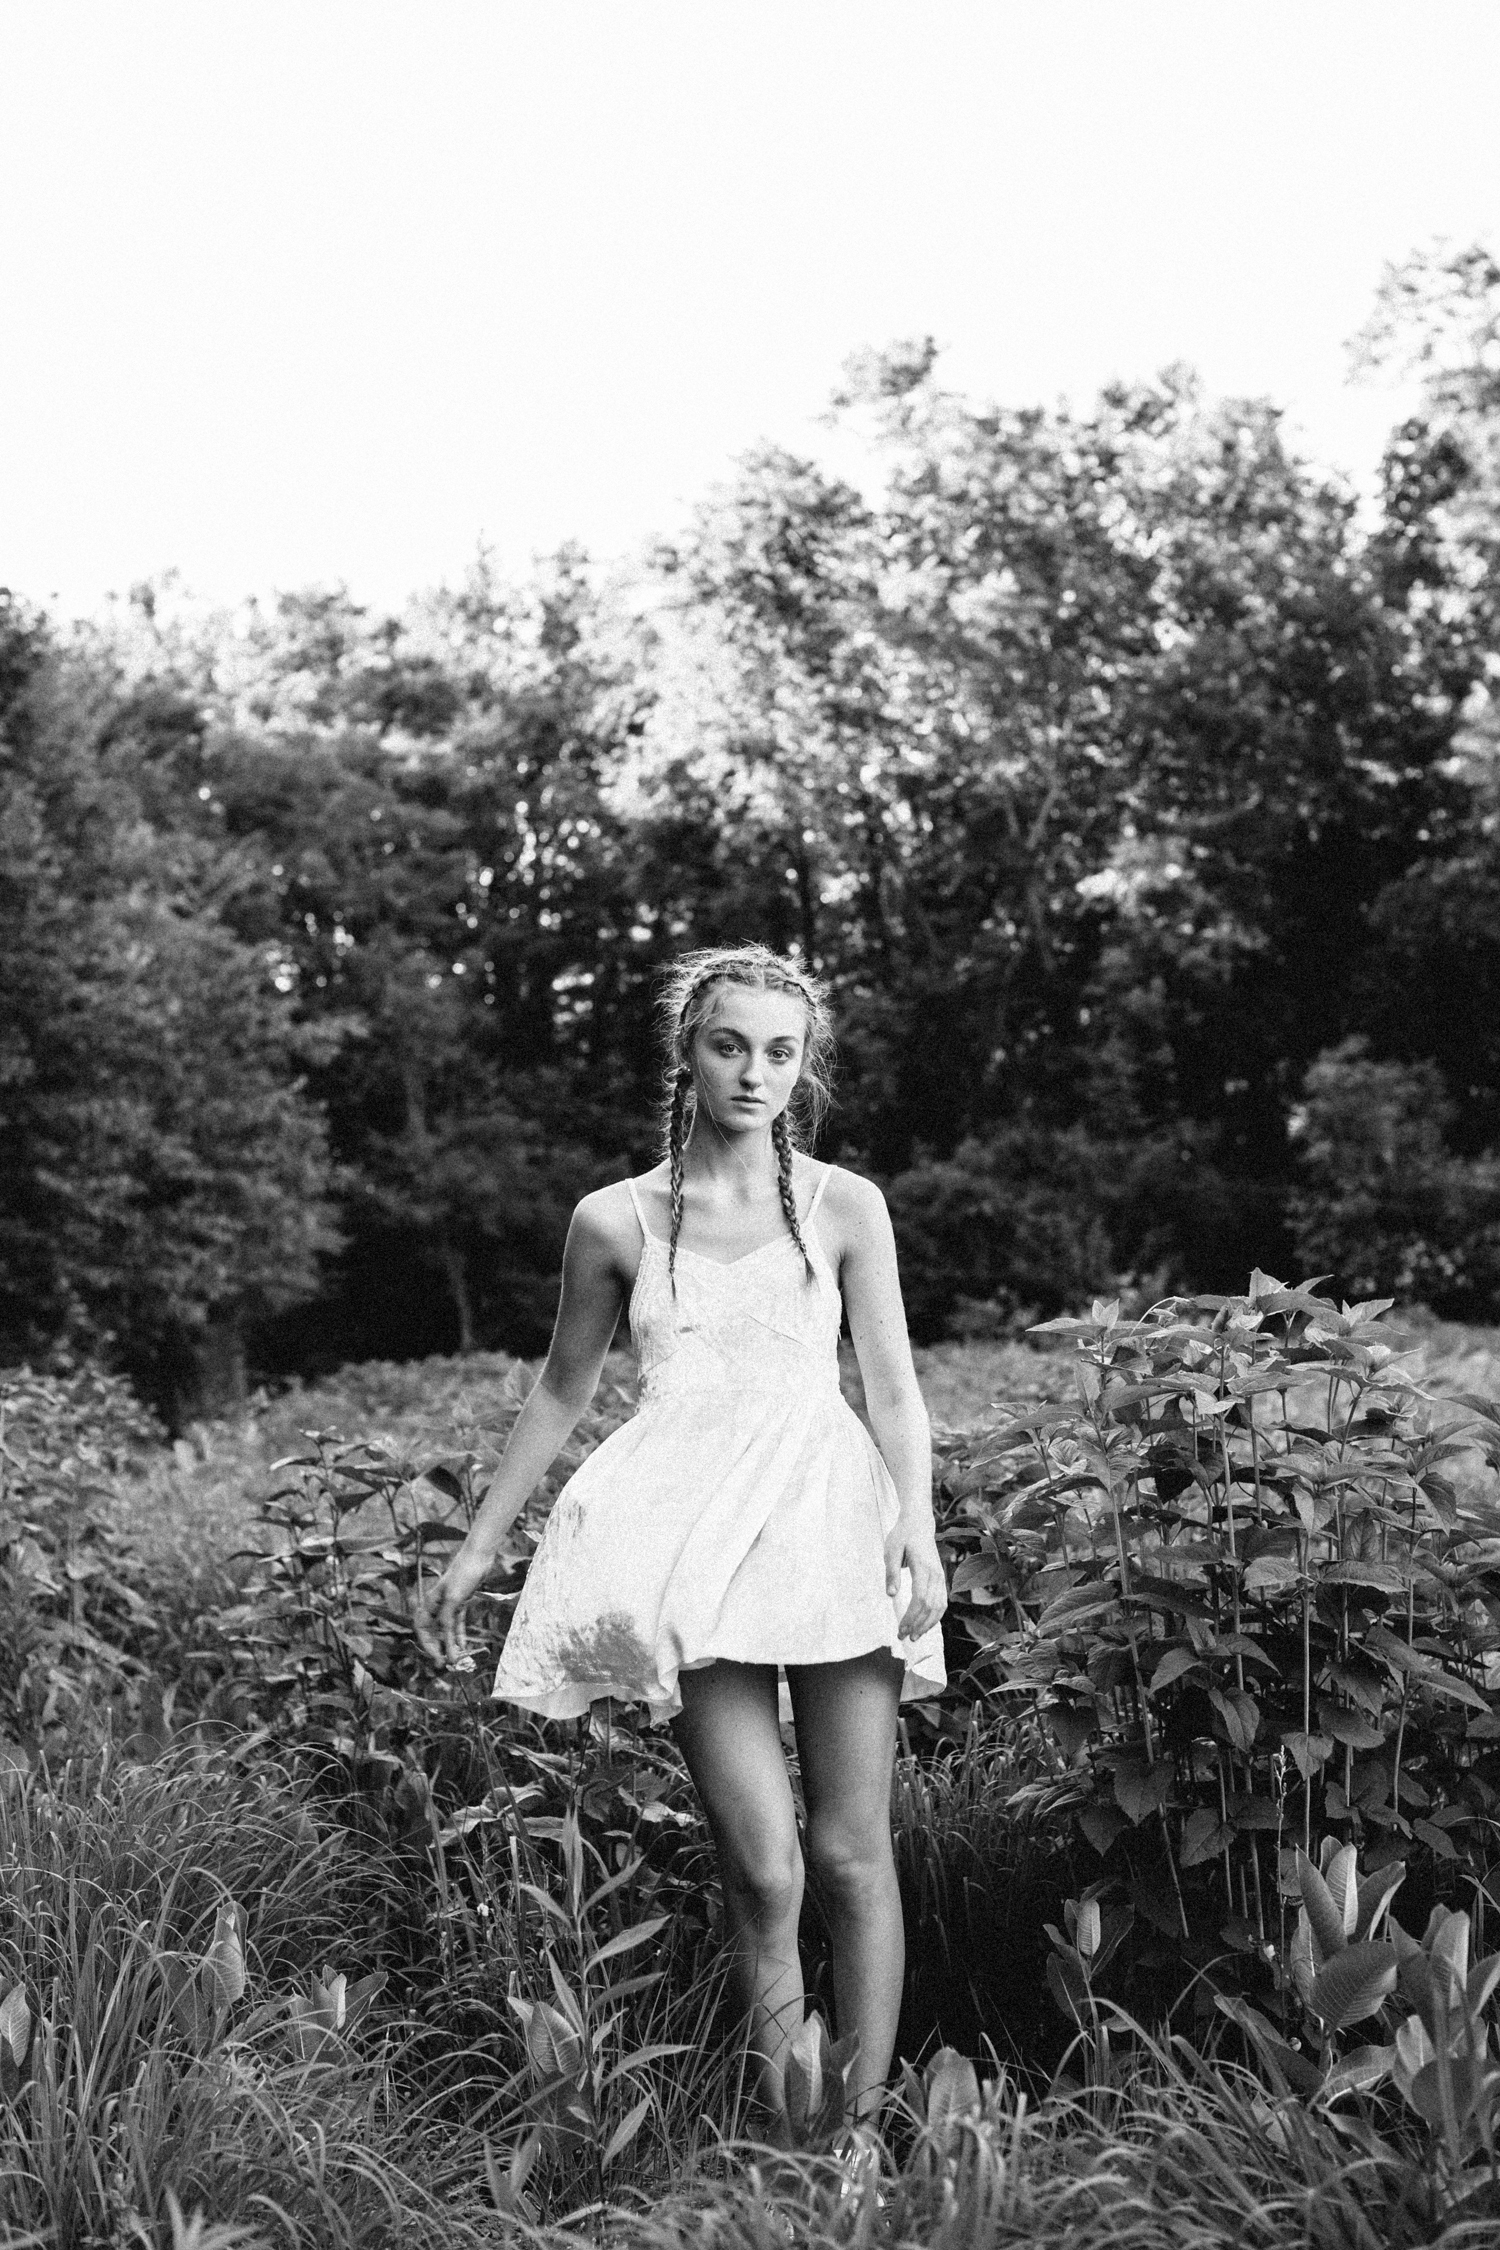 amber_byrne_mahoney_editorial_photography_new_york_teeth_magazine_wilhelmina_models_fashion_family_affairs_samantha_pleet_012.jpg